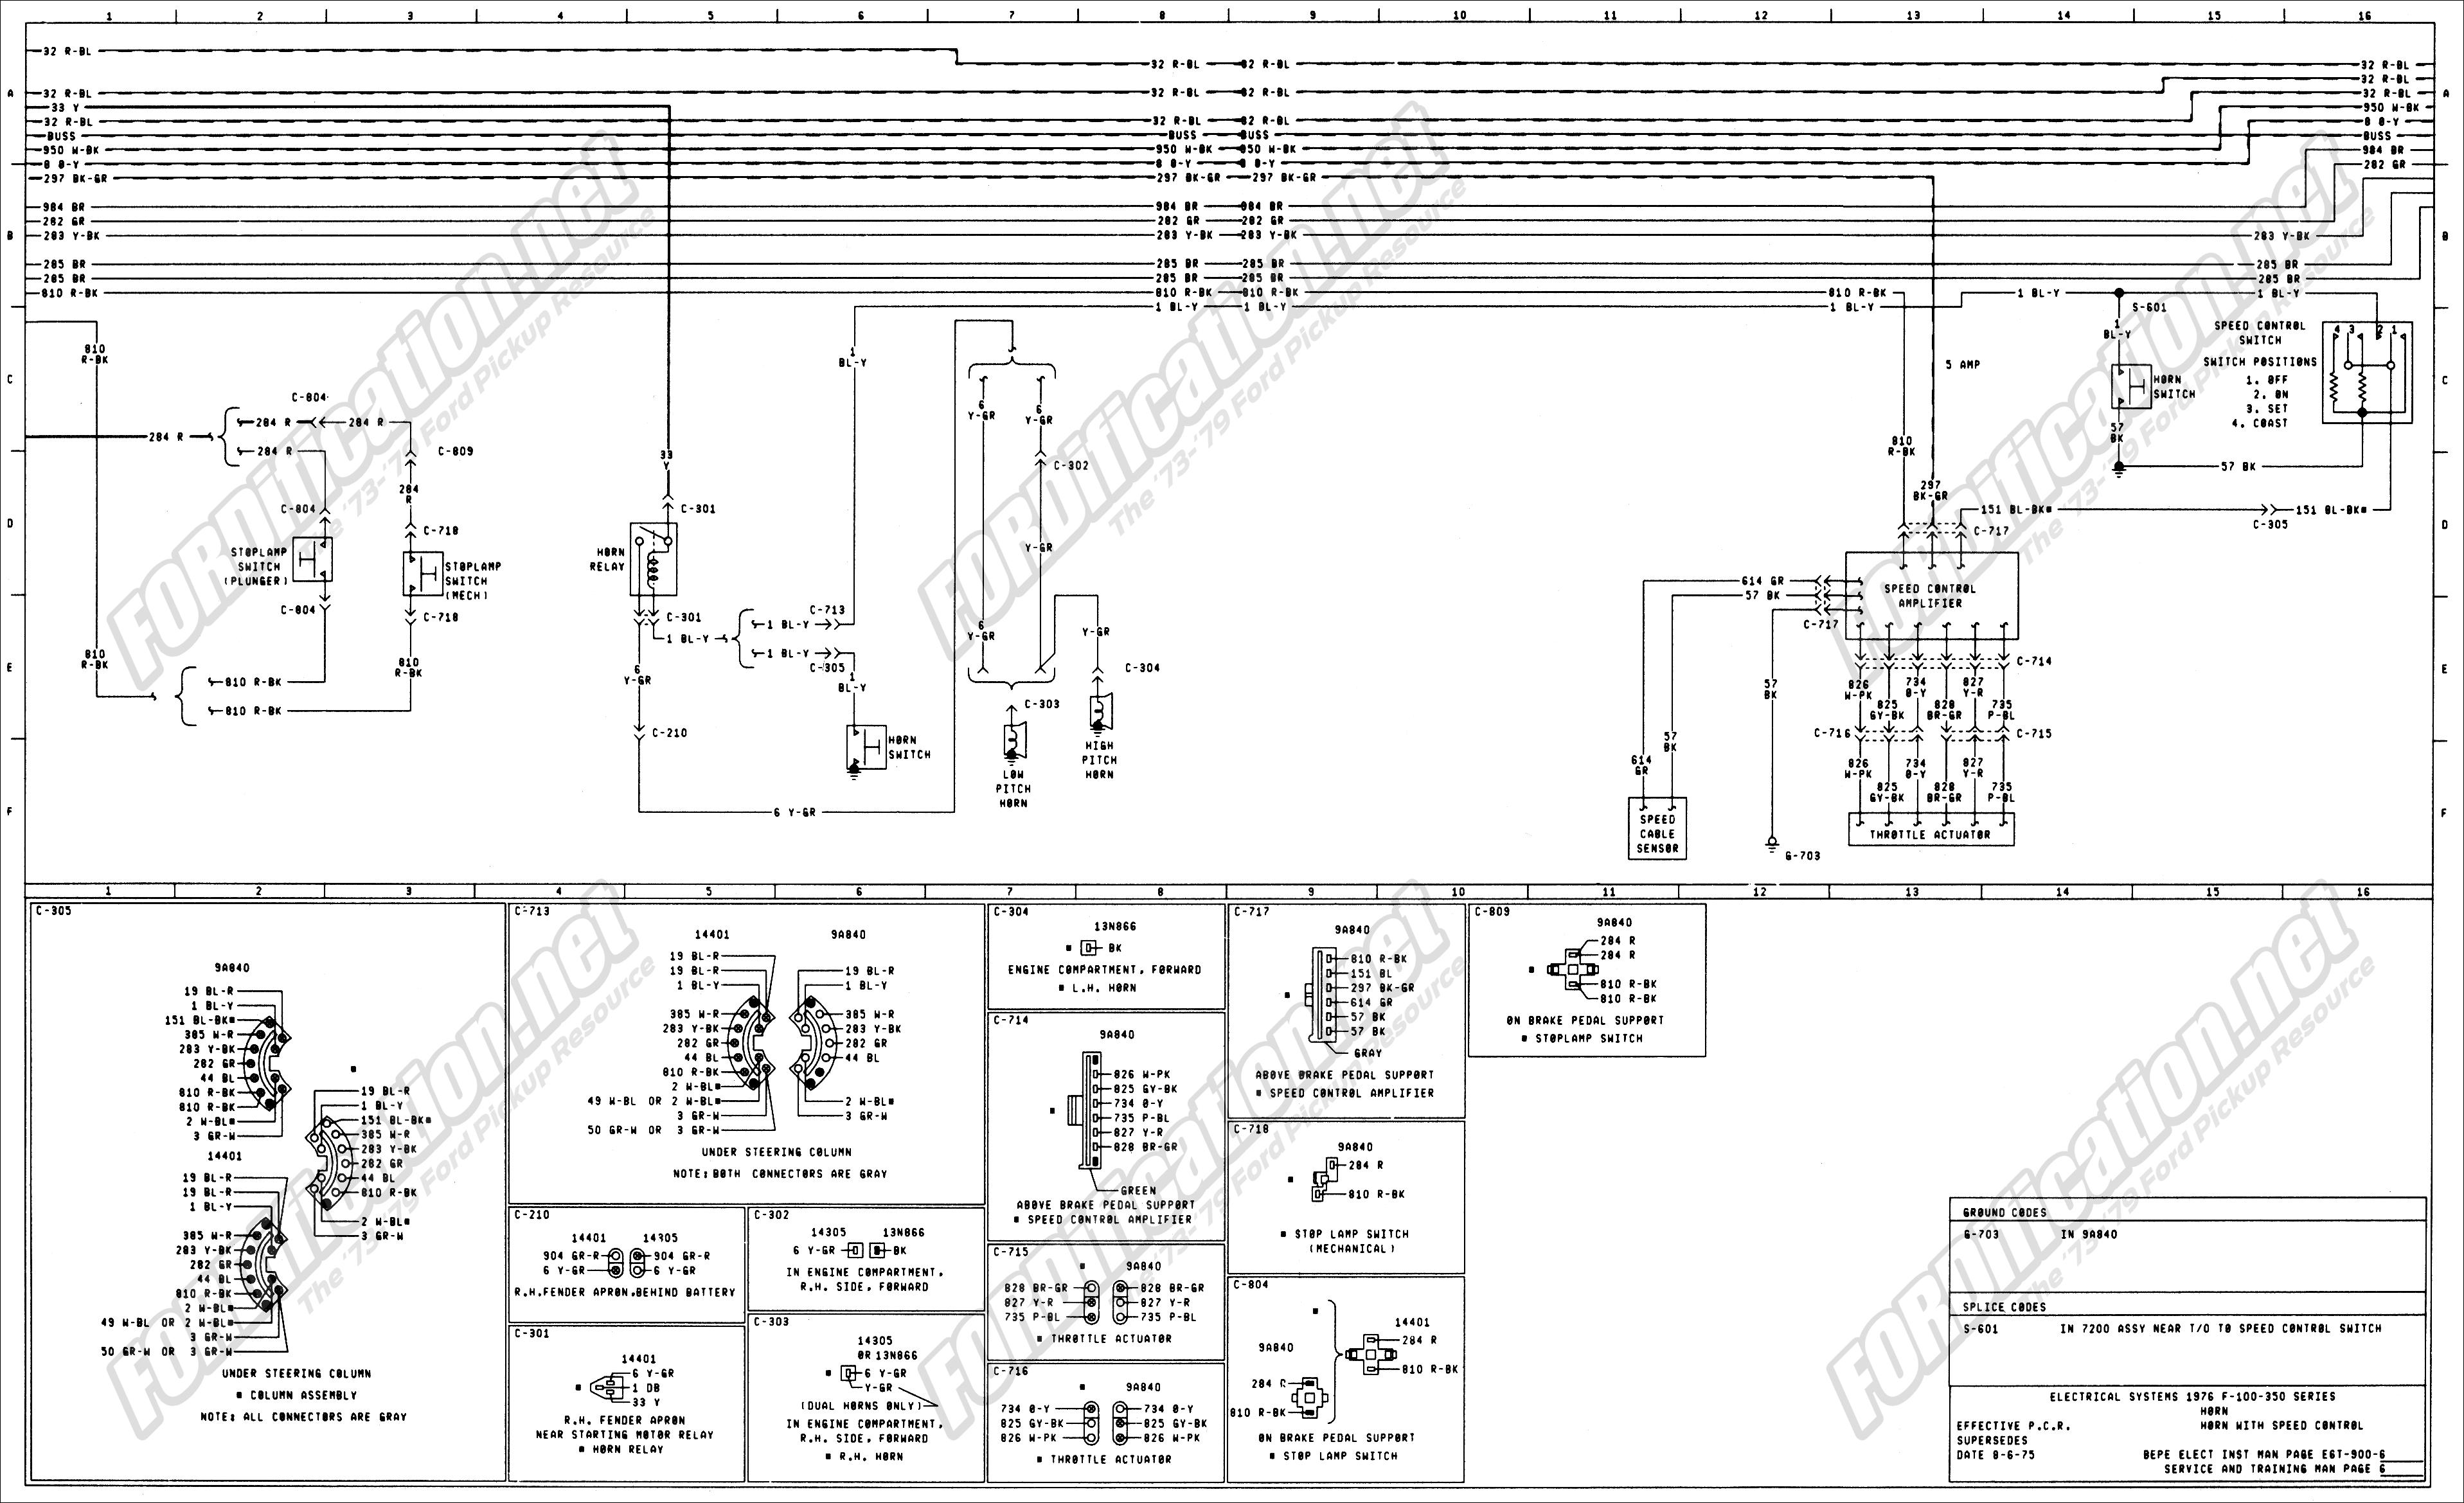 1968 Ford F 250 Radio Wiring Diagram 05 Impala Stereo Wiring Diagram For Wiring Diagram Schematics